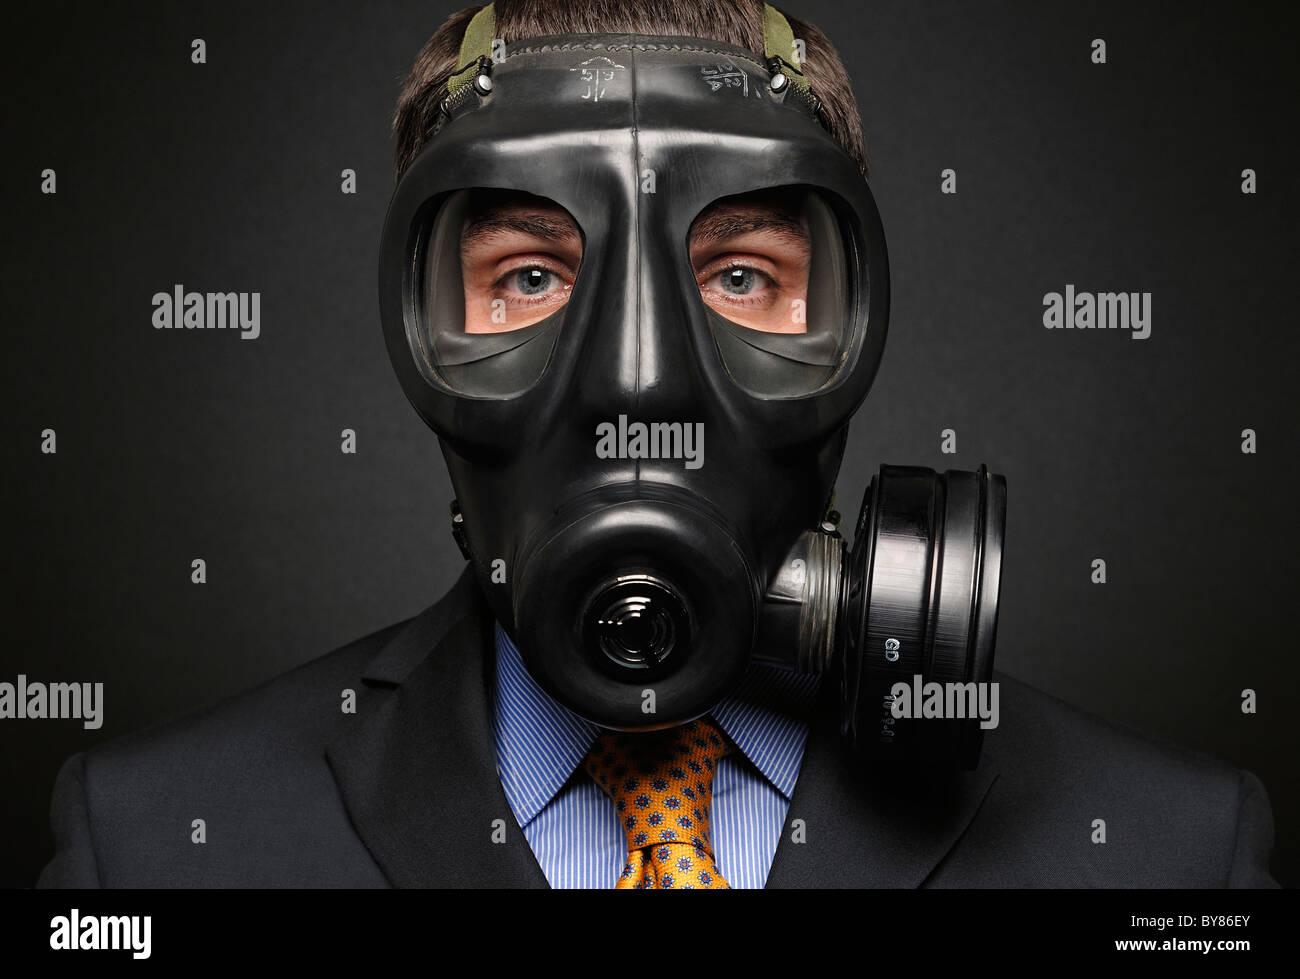 Imprenditore indossando maschera a gas Foto Stock